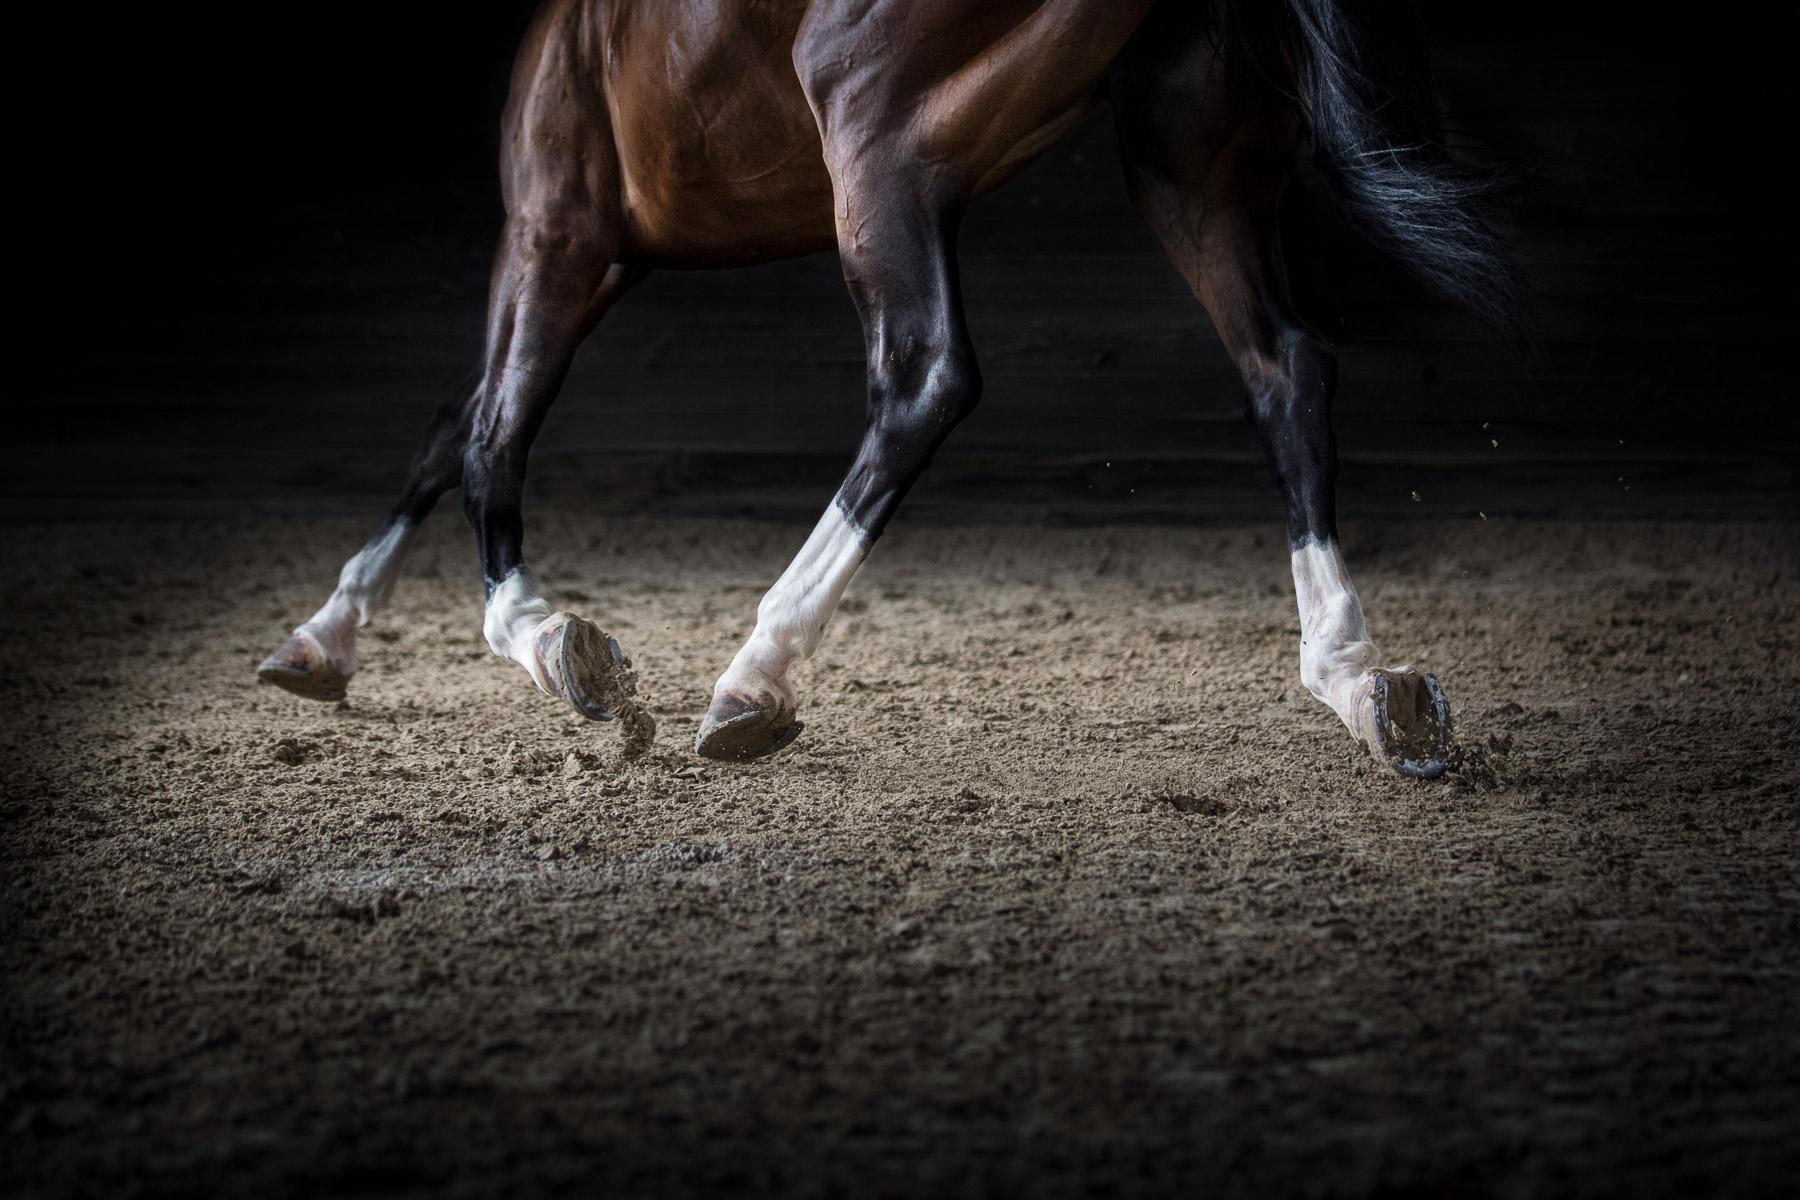 equine-horse-photography-horse-riding-fine-art.jpg